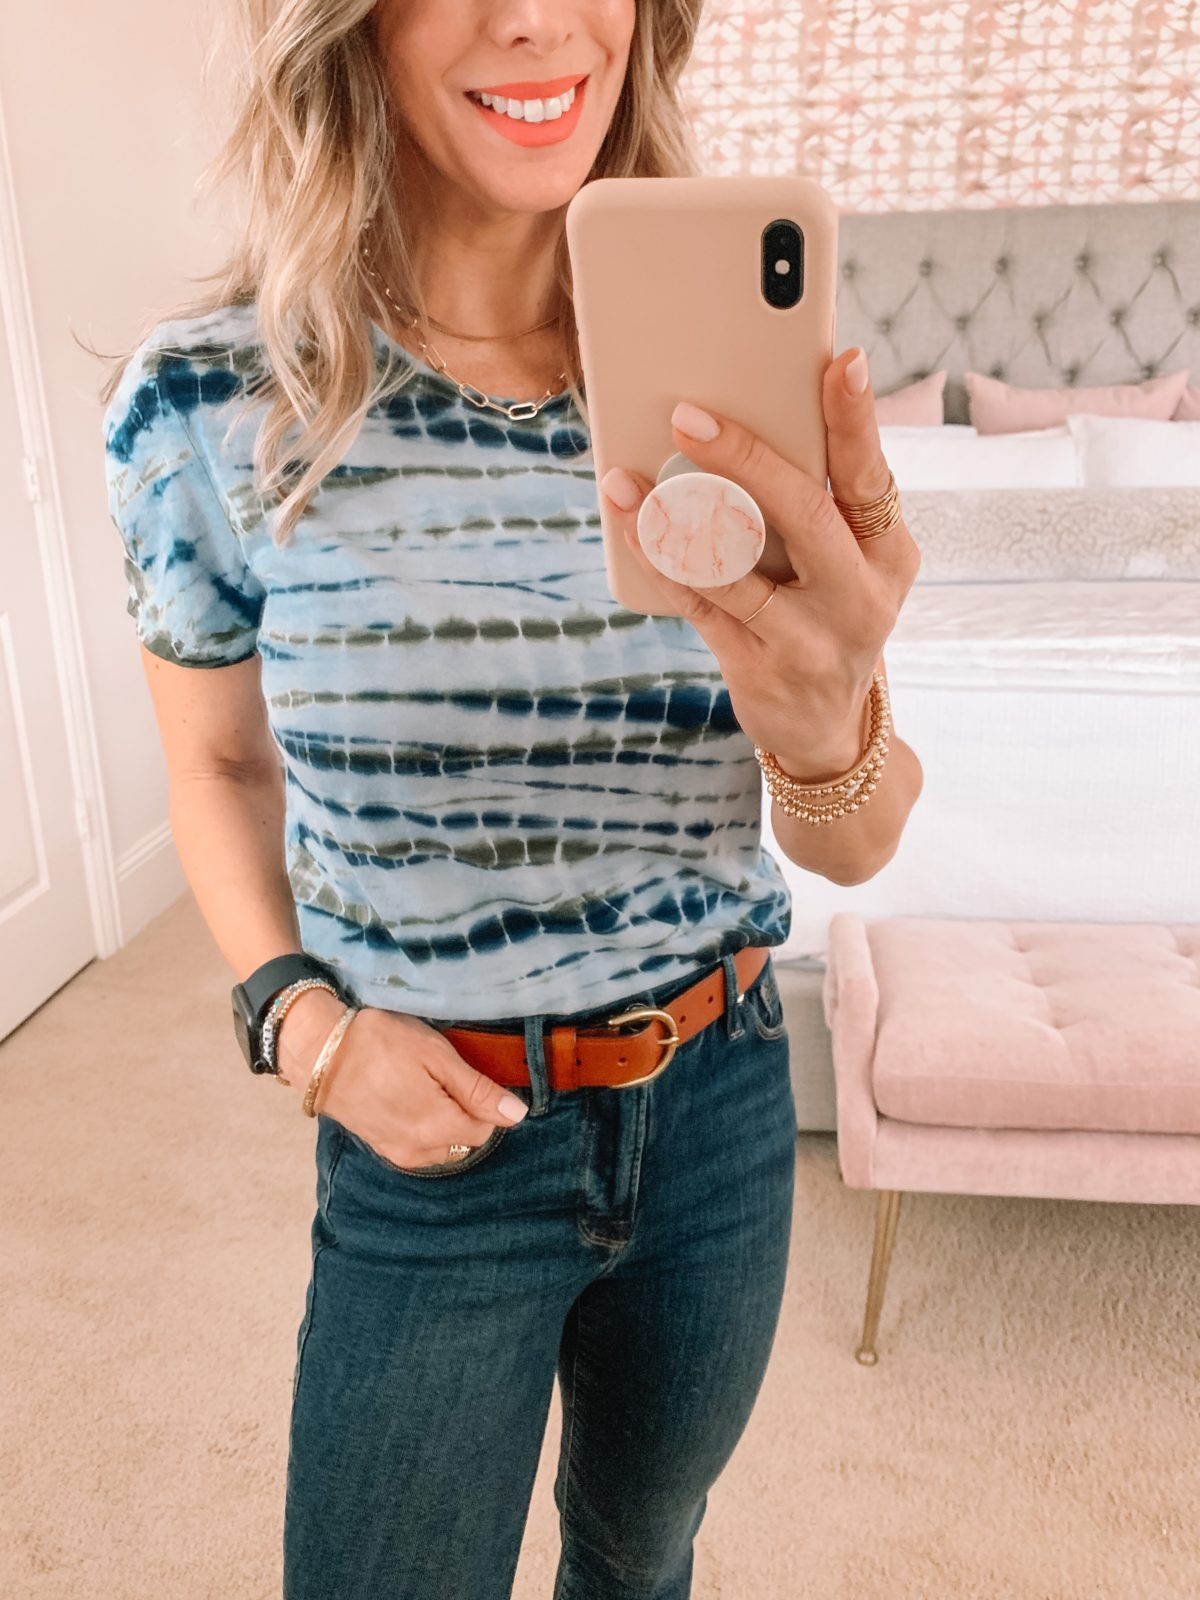 Dressing Room Finds, Nordstrom, LOFT, Tie Dye Tee, Jeans, Sandals